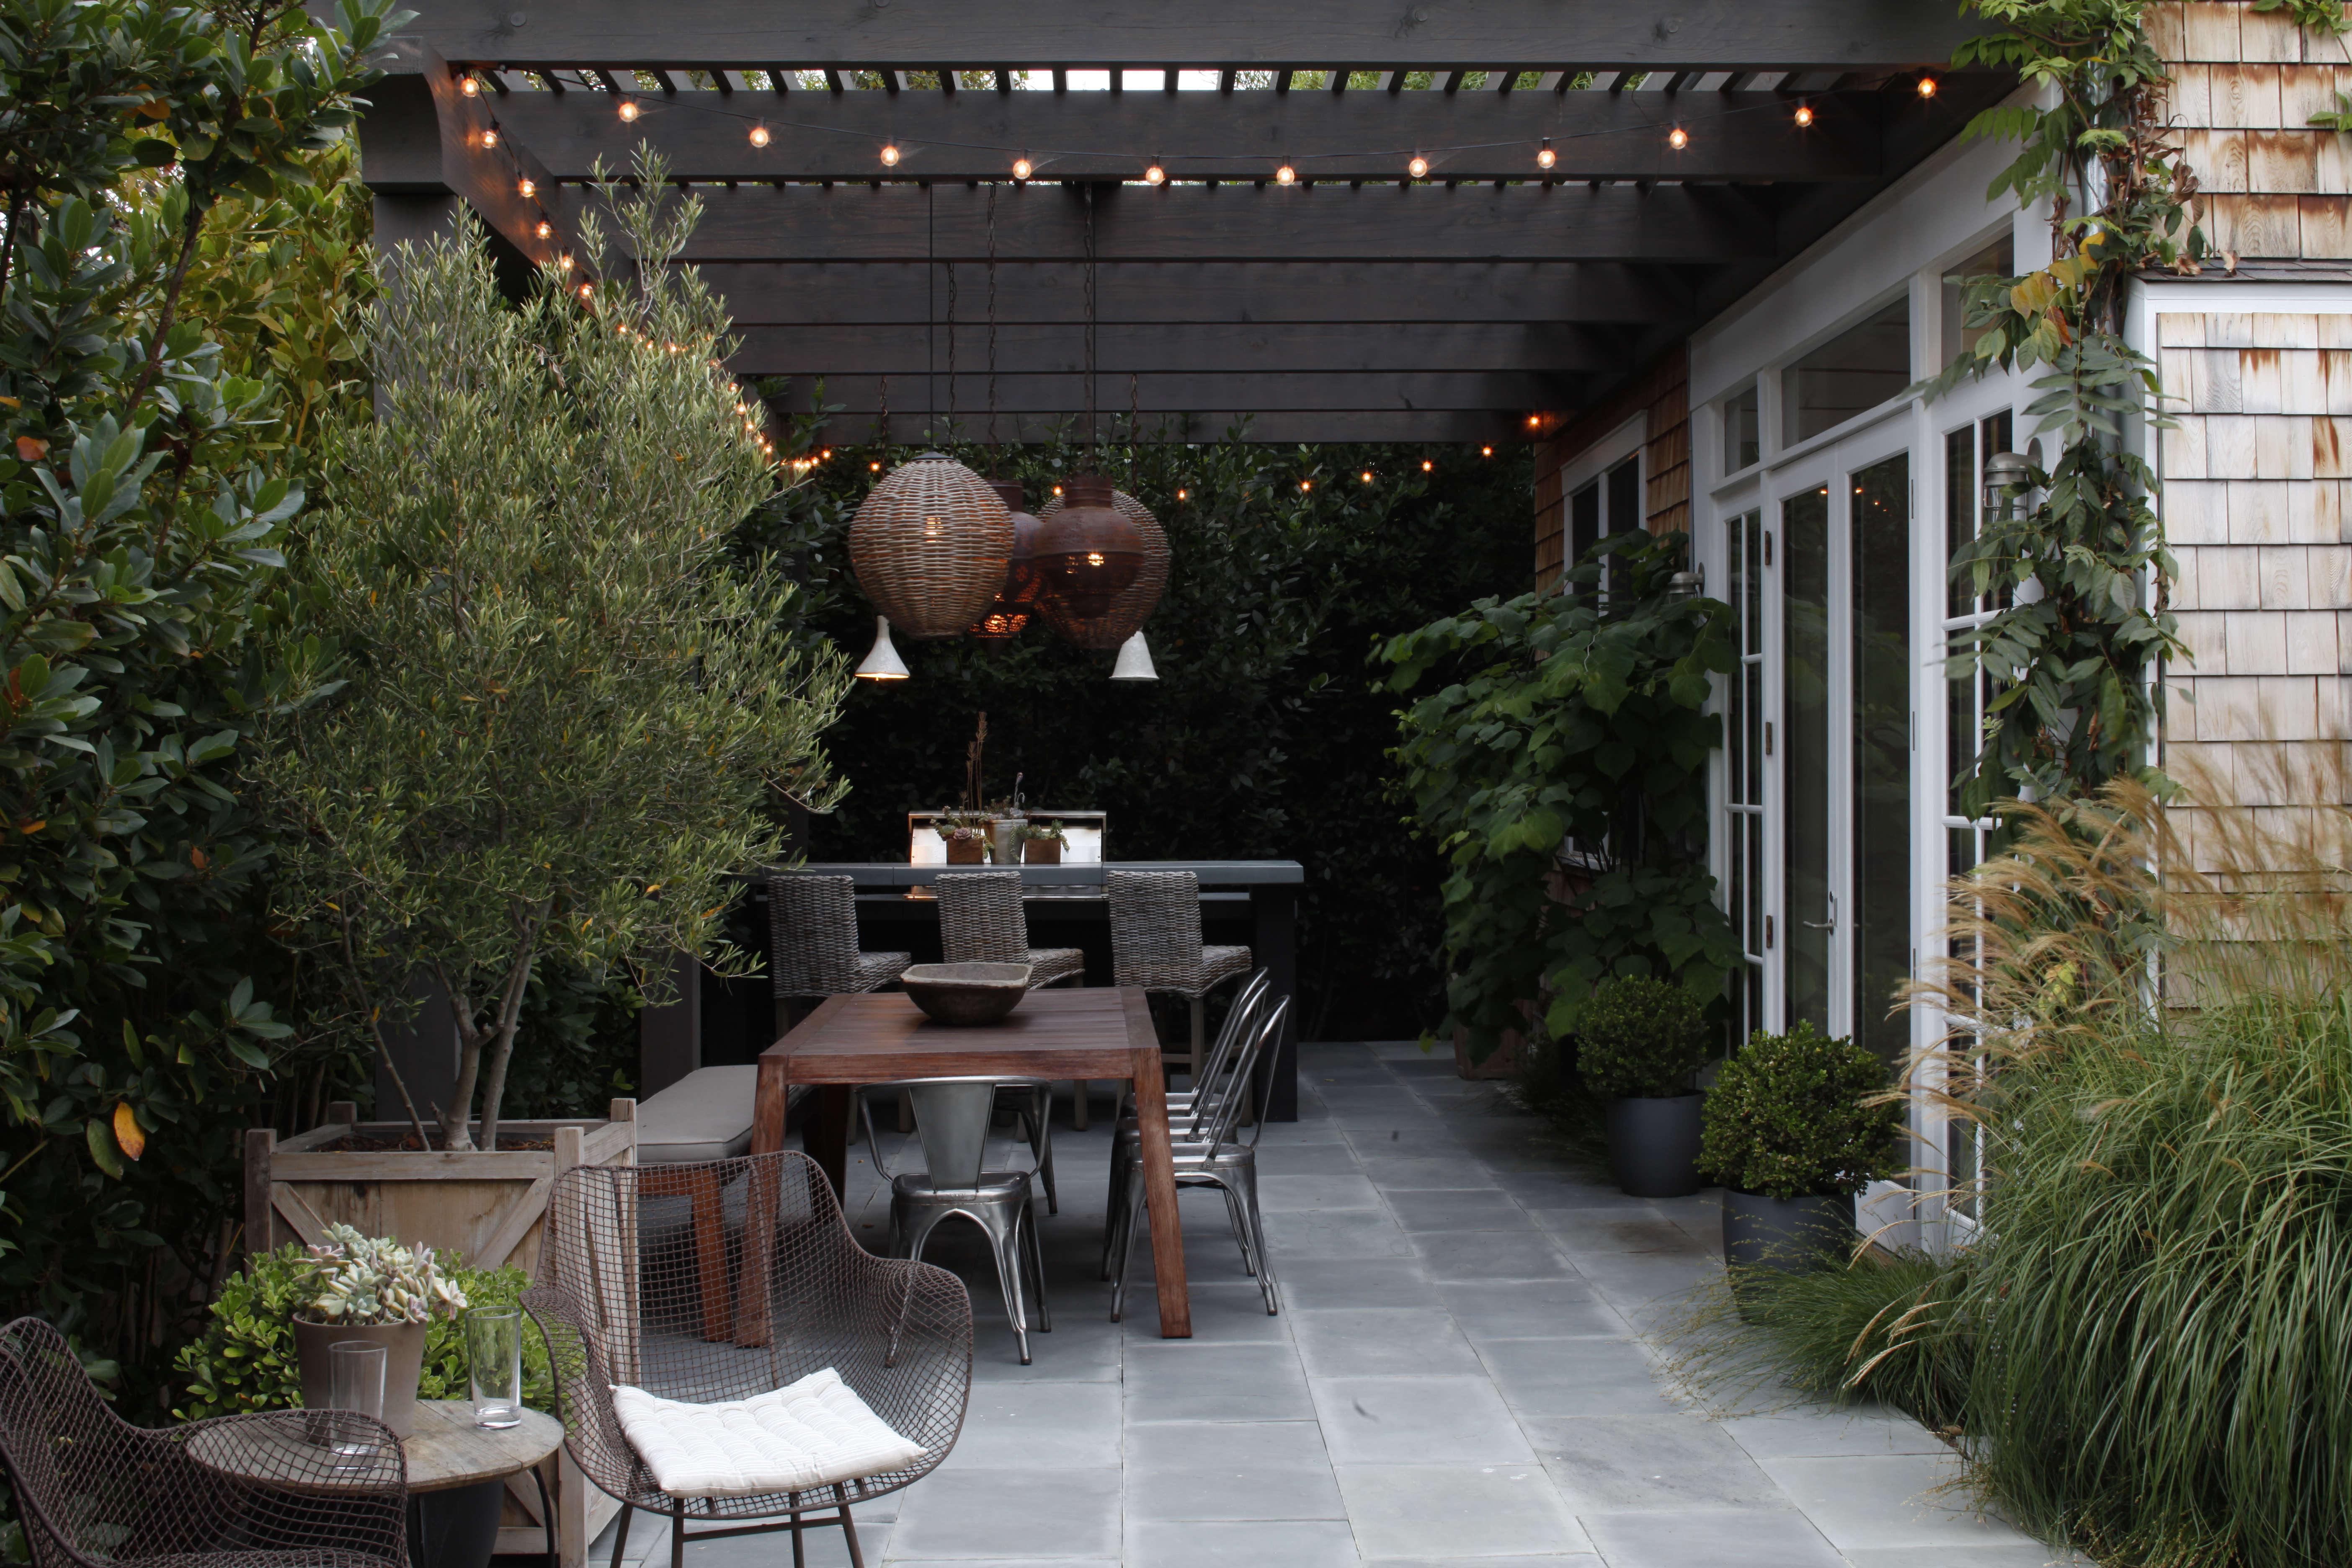 Mark-Tessier-pacific-palisades-garden-bluestone-pavers-pergola-dining